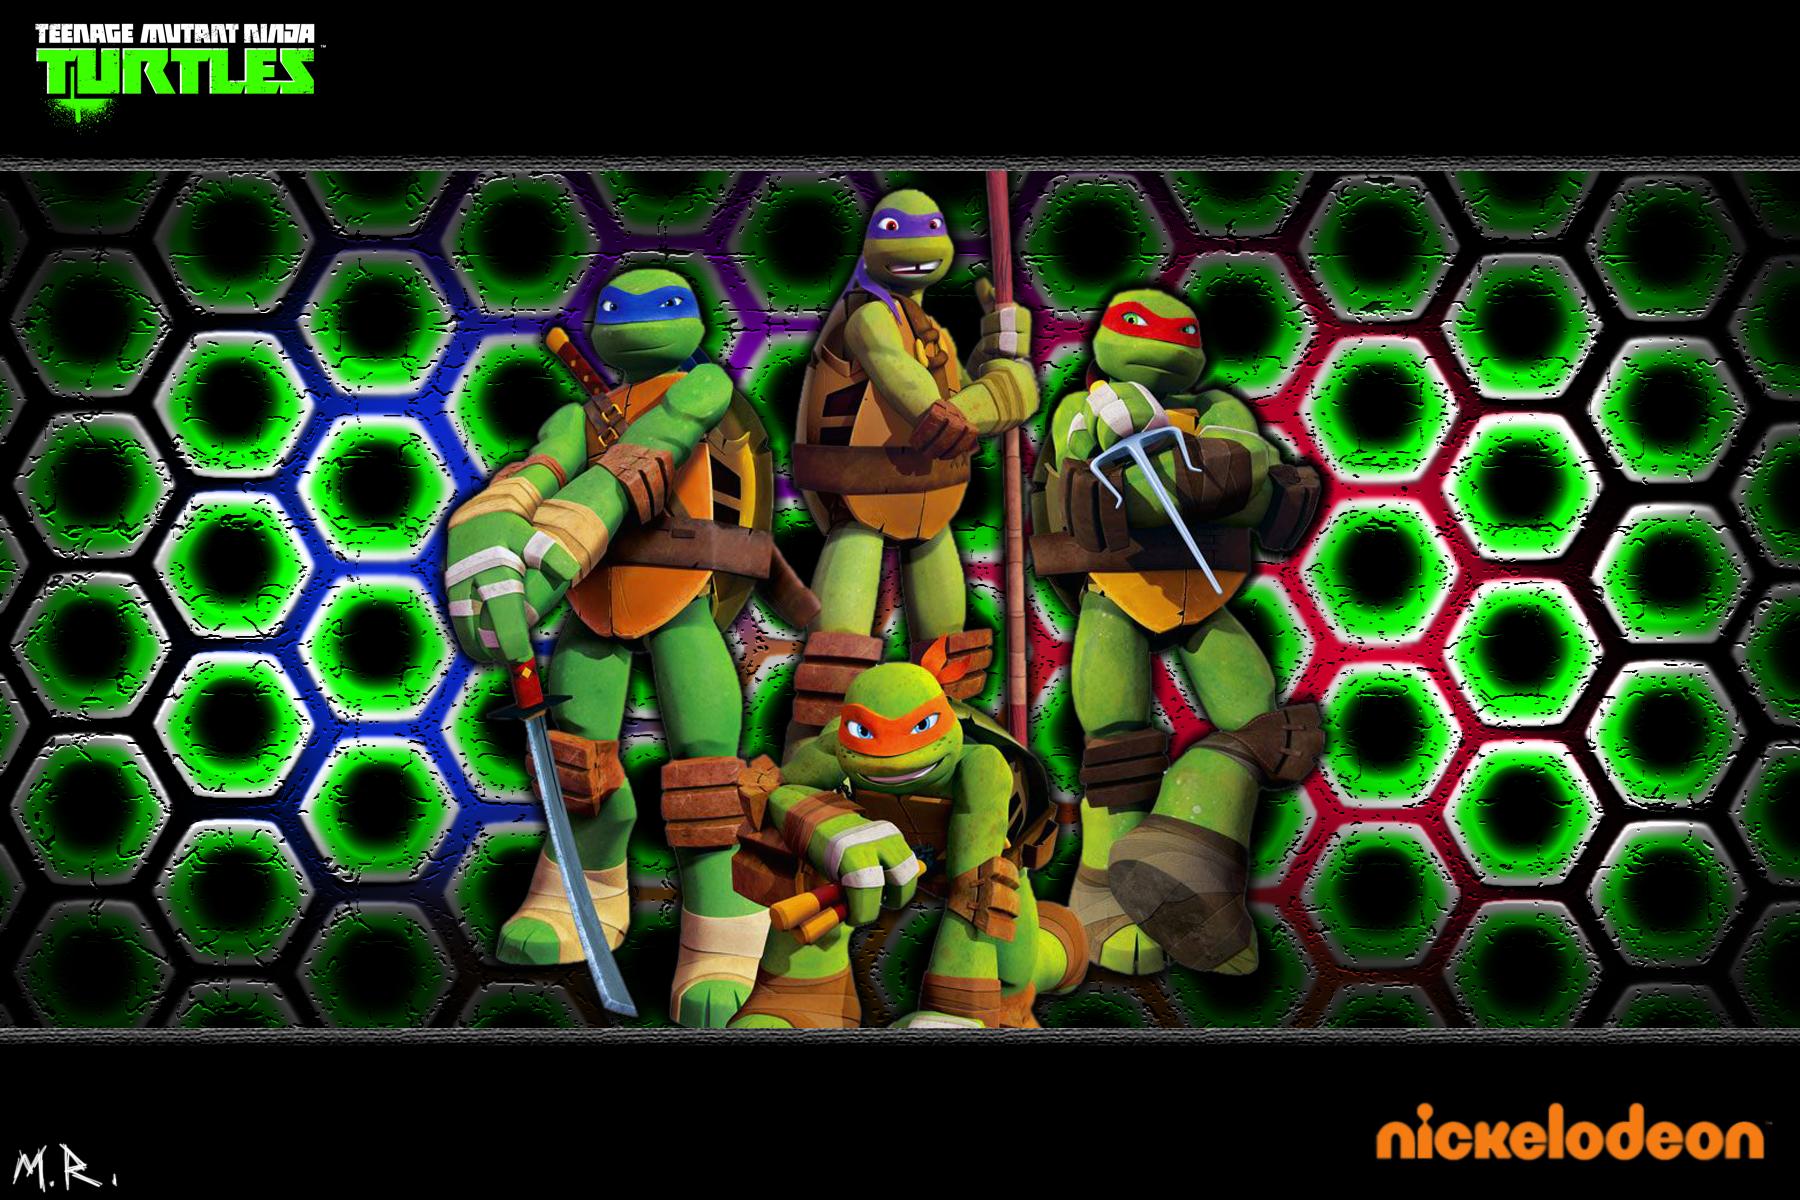 ShadowNinja976 237 157 2012 Nickelodeon TMNT Wallpaper By